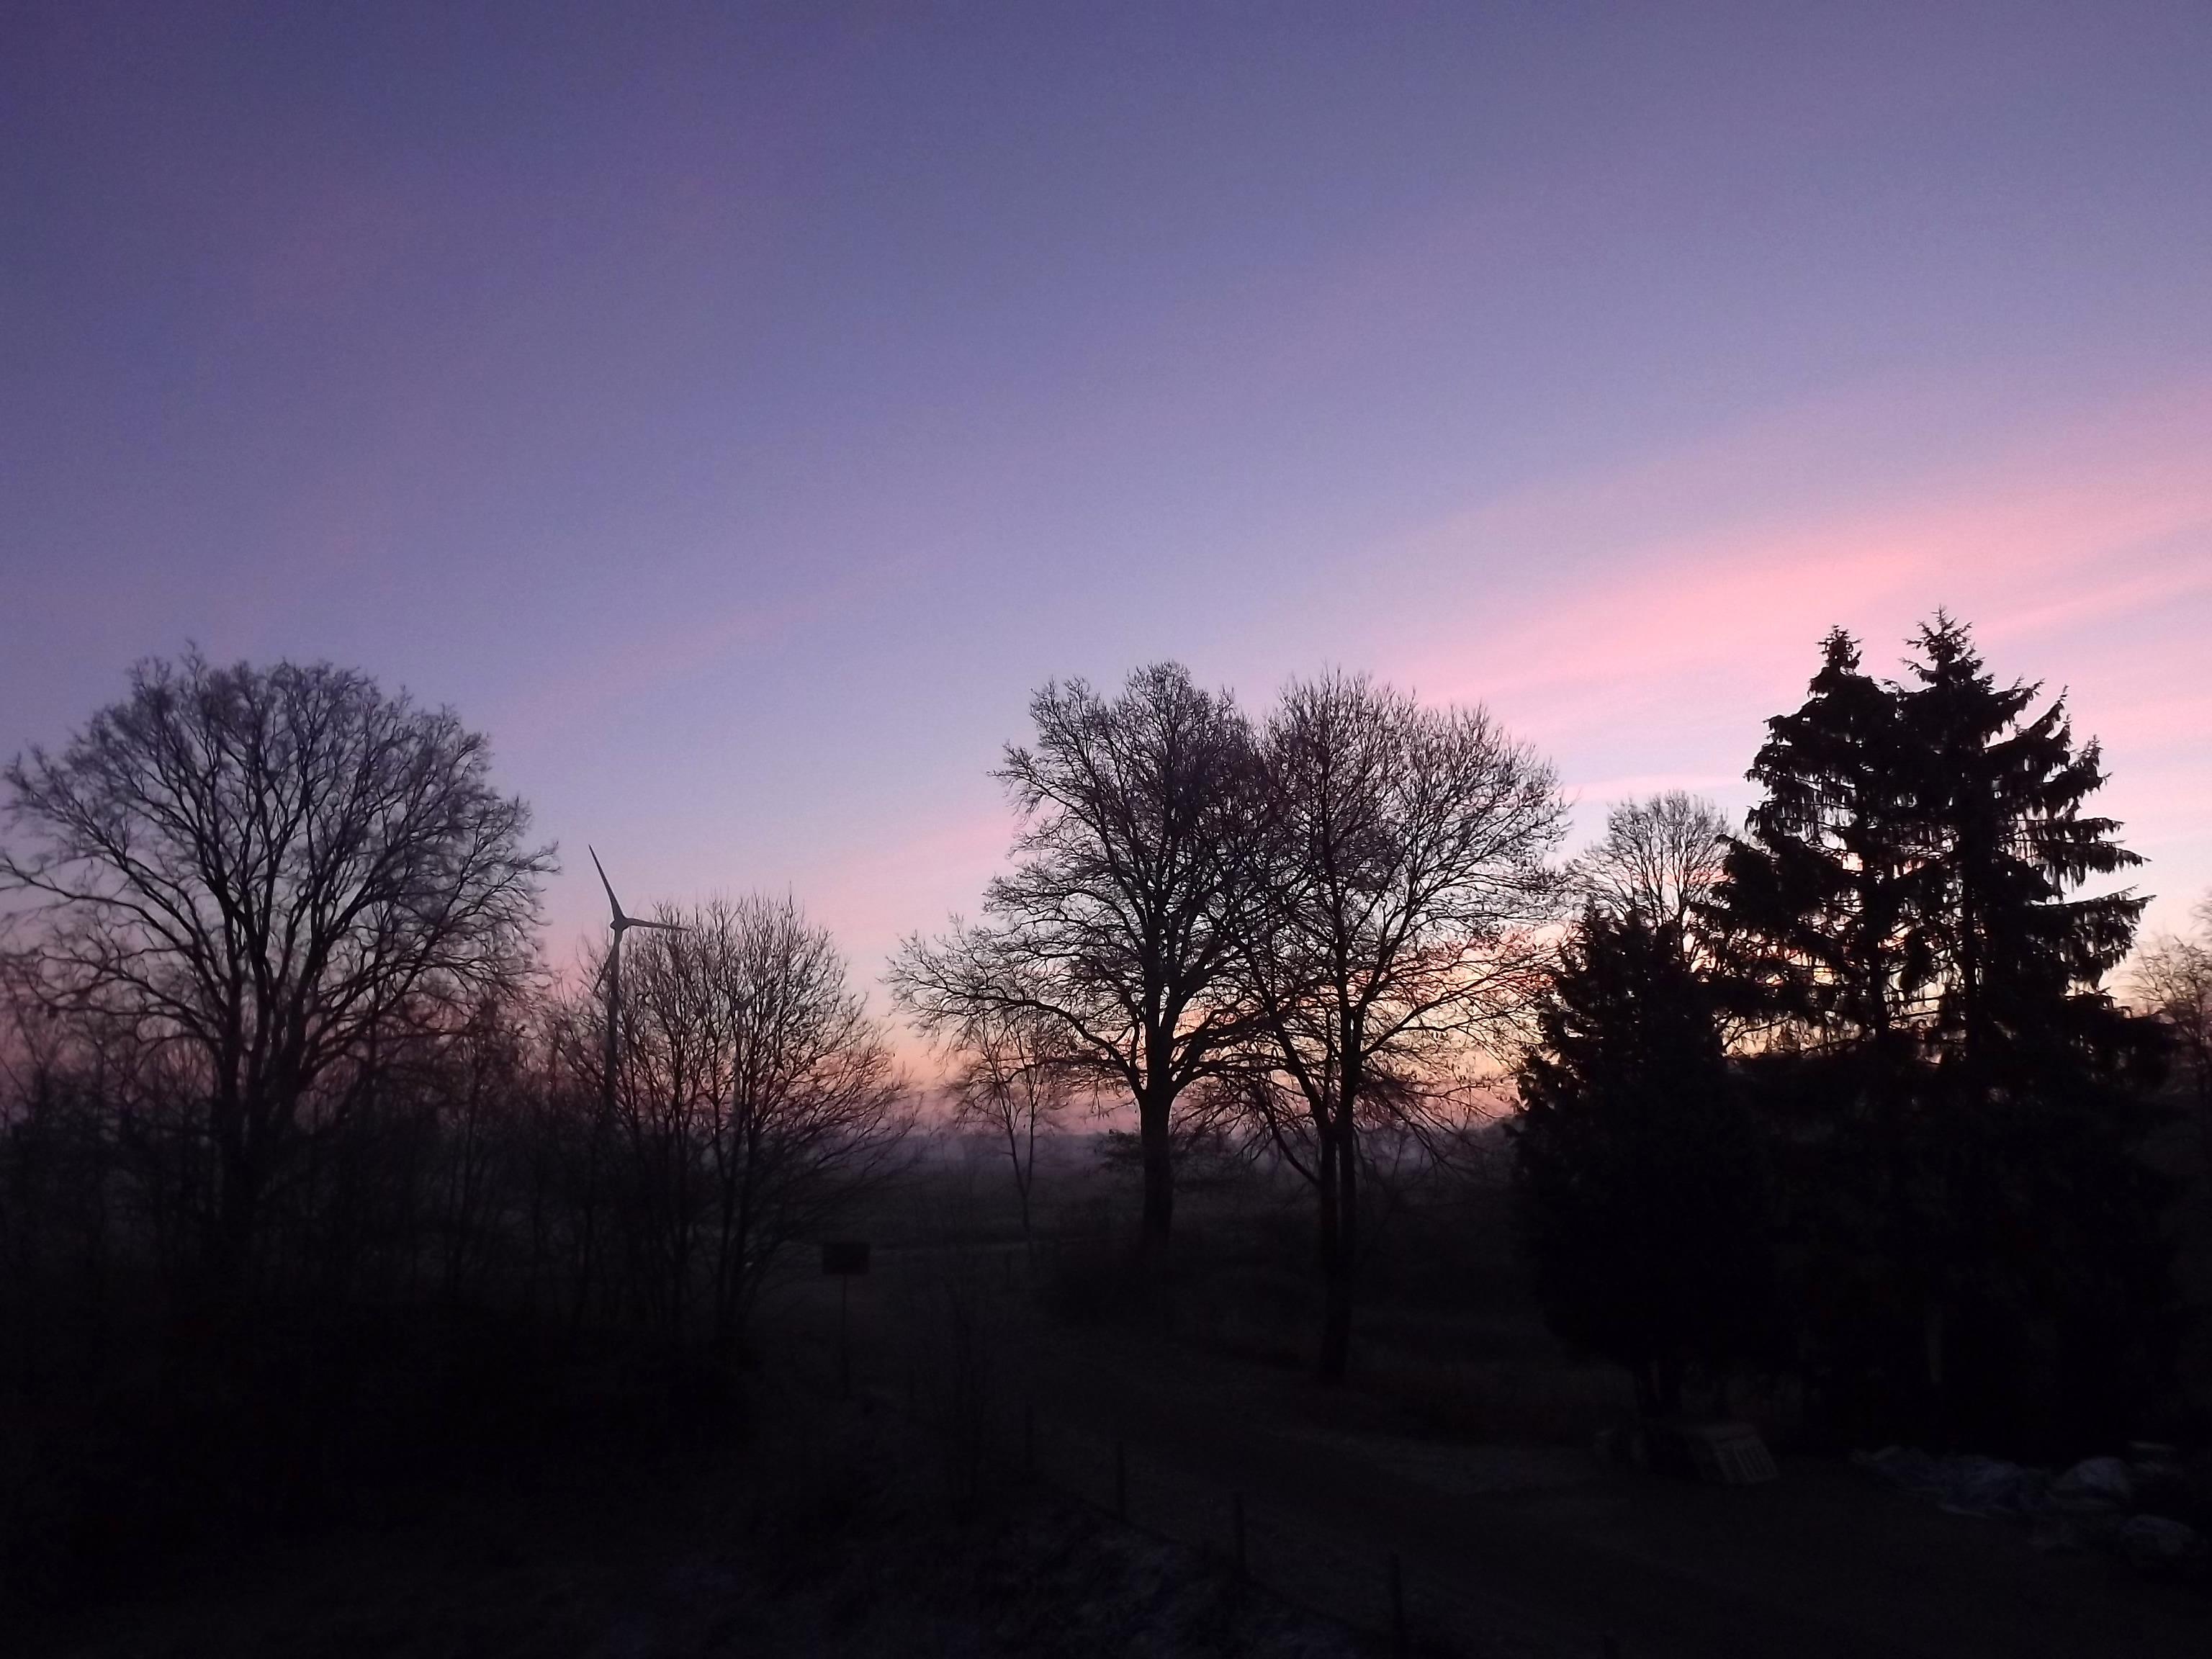 8402-frost-morgenhimmel-morgenroete-sonnenaufgang